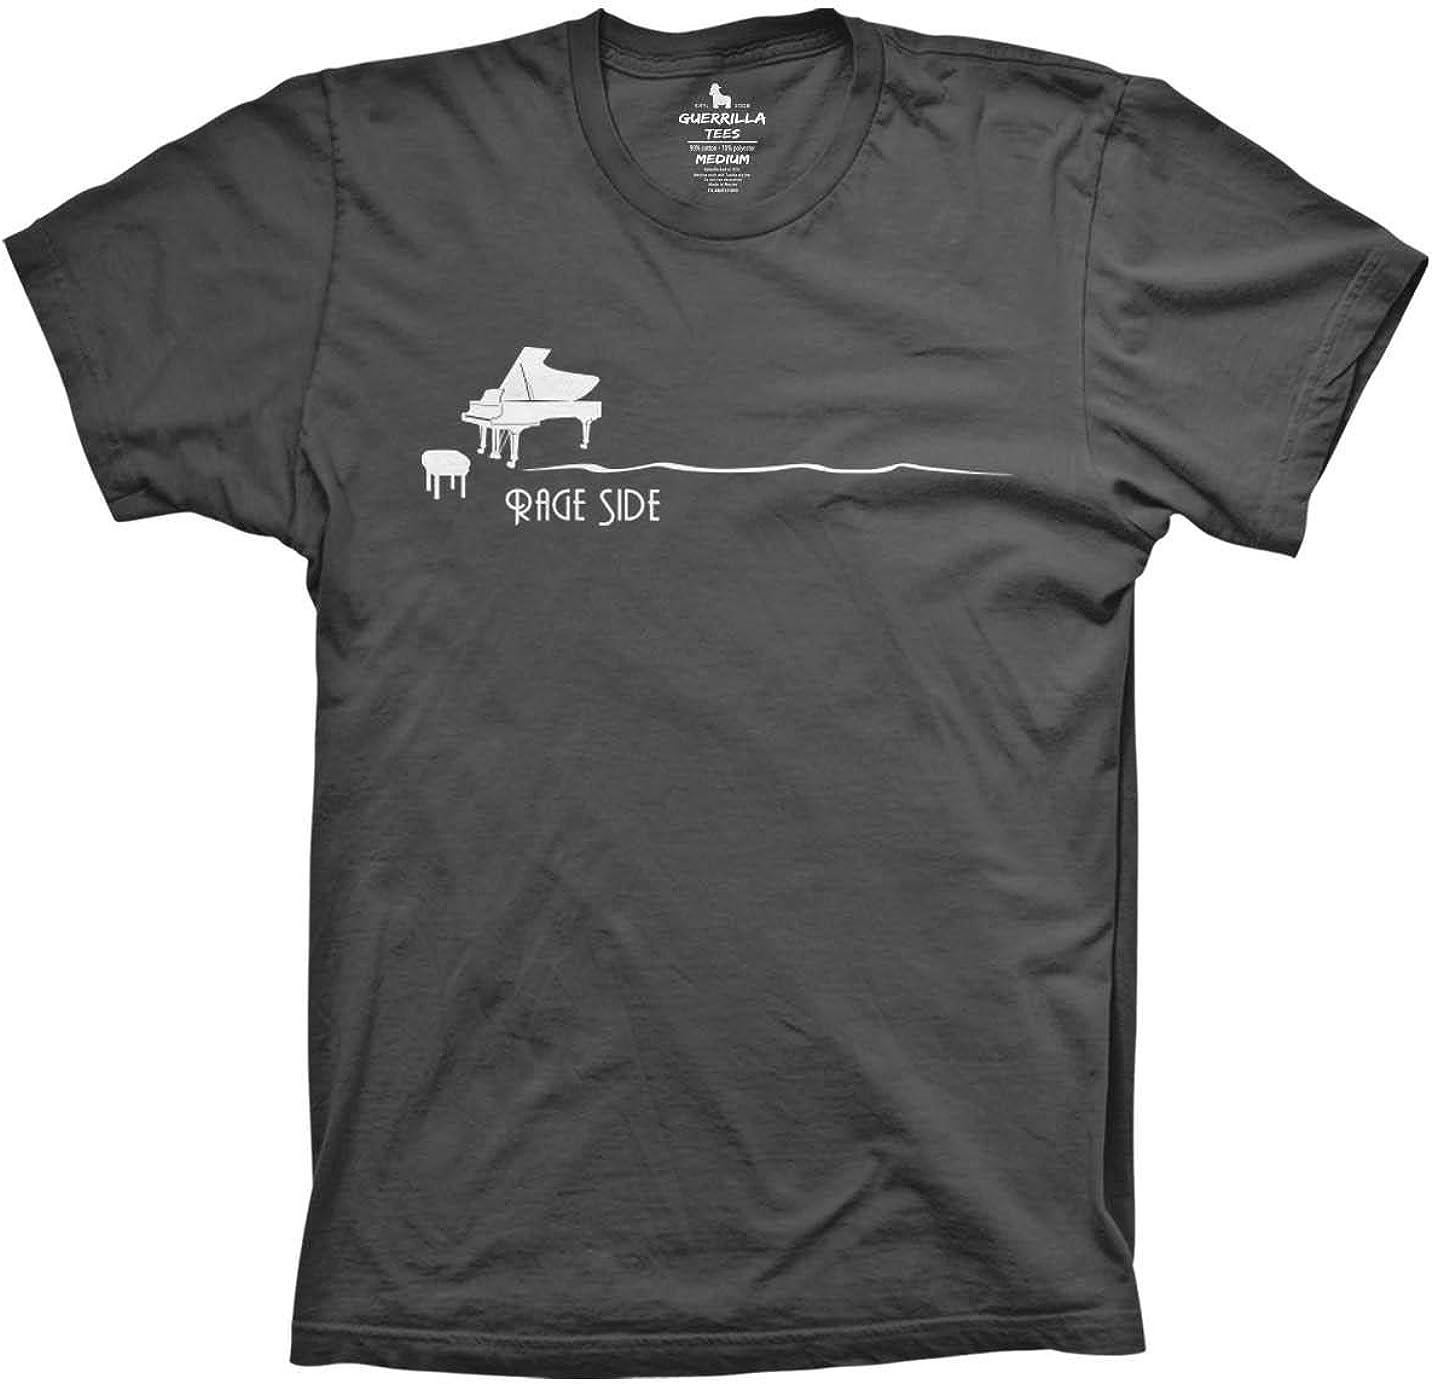 Guerrilla Tees Rage Side Shirt Funny Concert Tshirts Music Piano Tshirts 61a5nFpg6jL